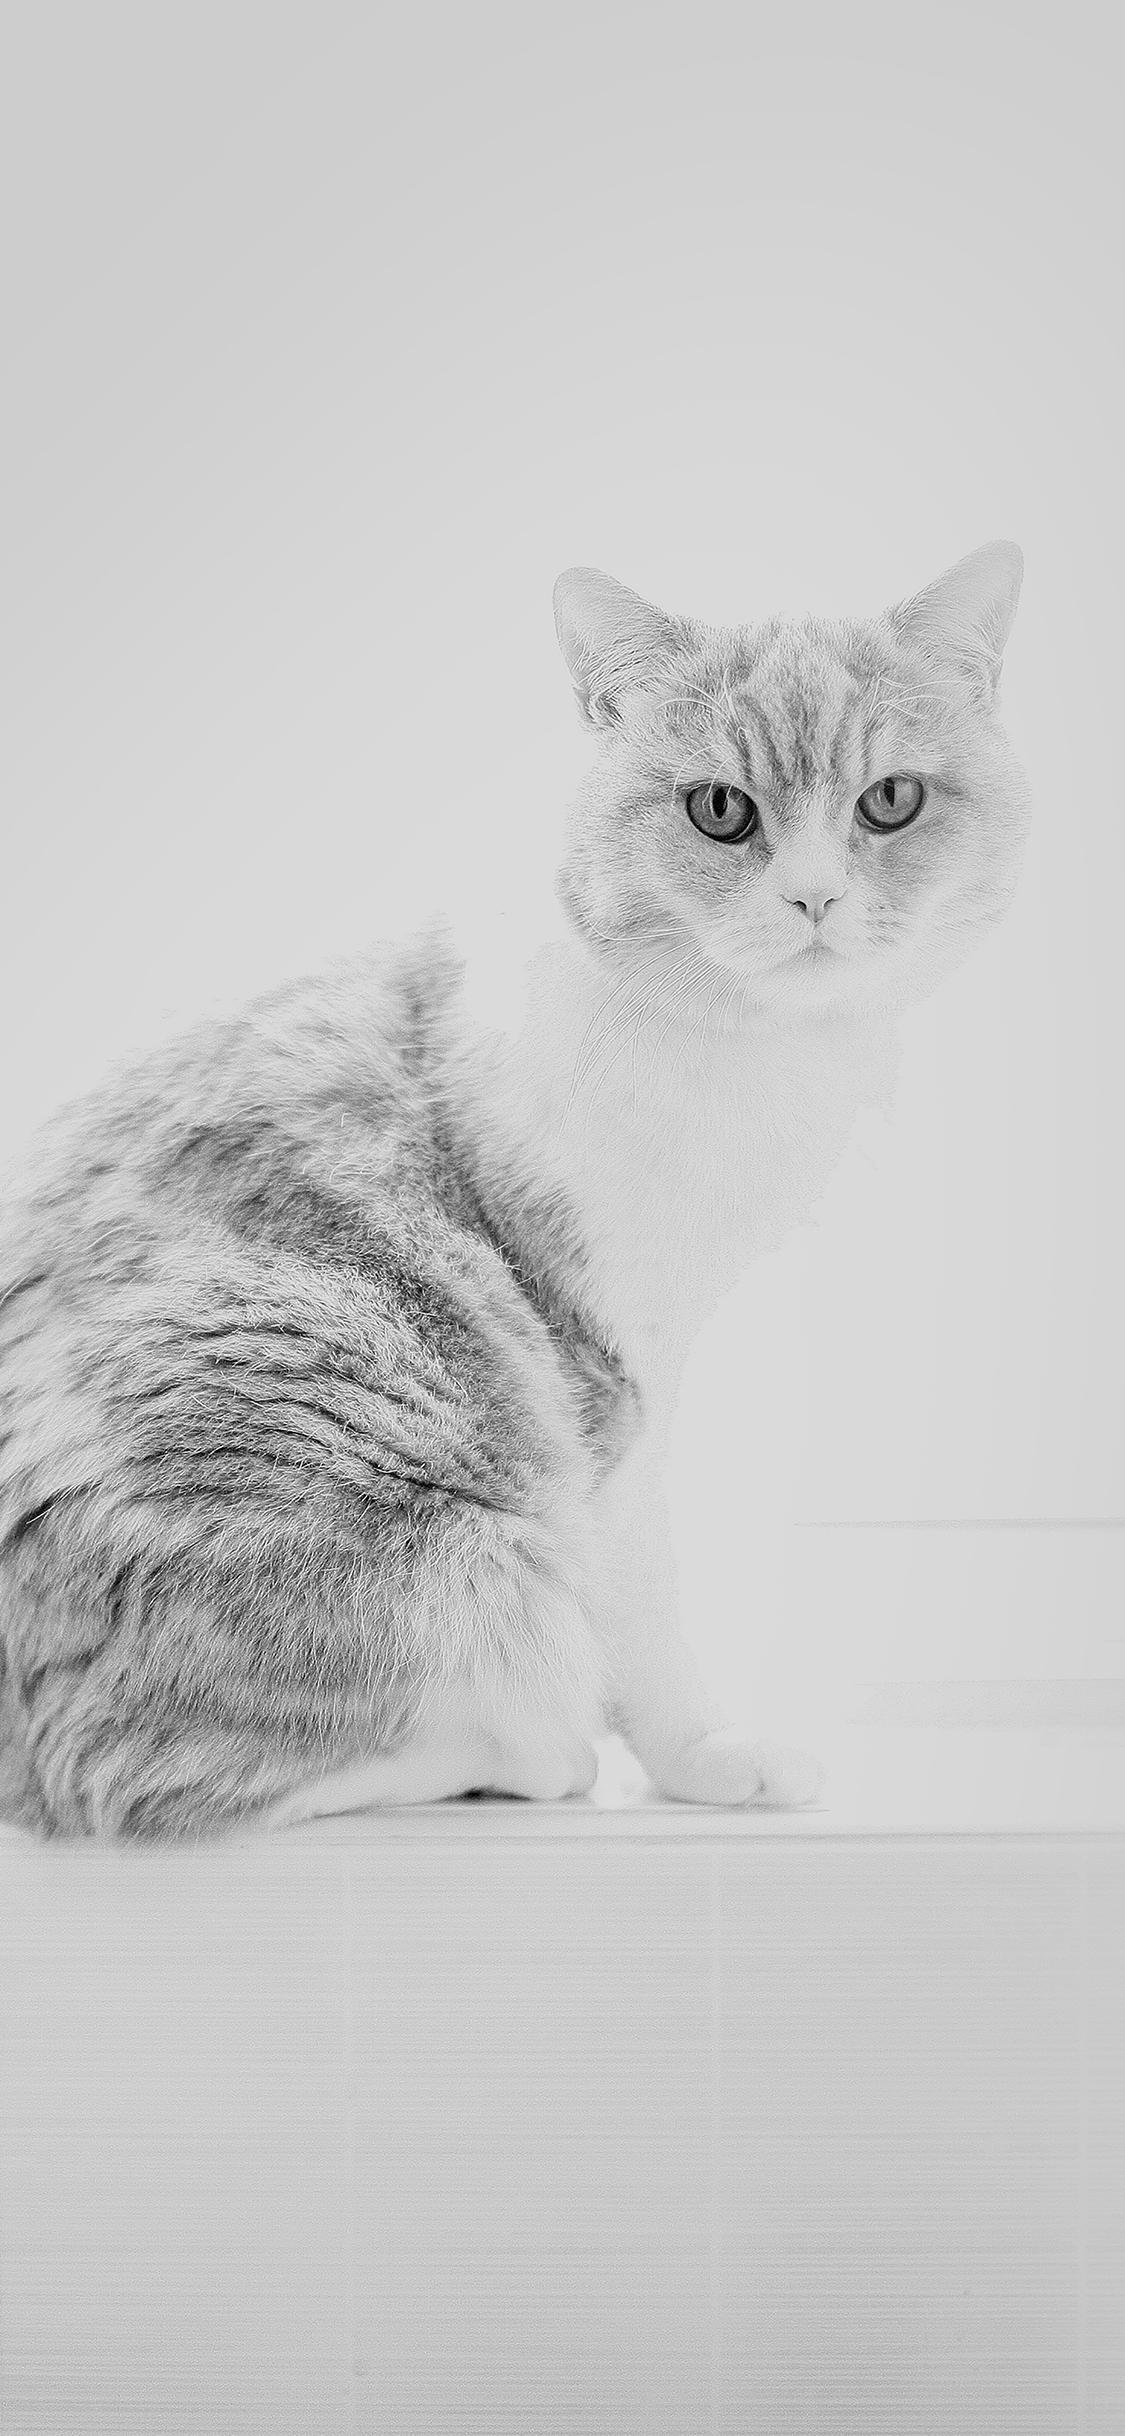 iPhone X 桌布下載、iPhone 桌布下載、貓、貓桌布